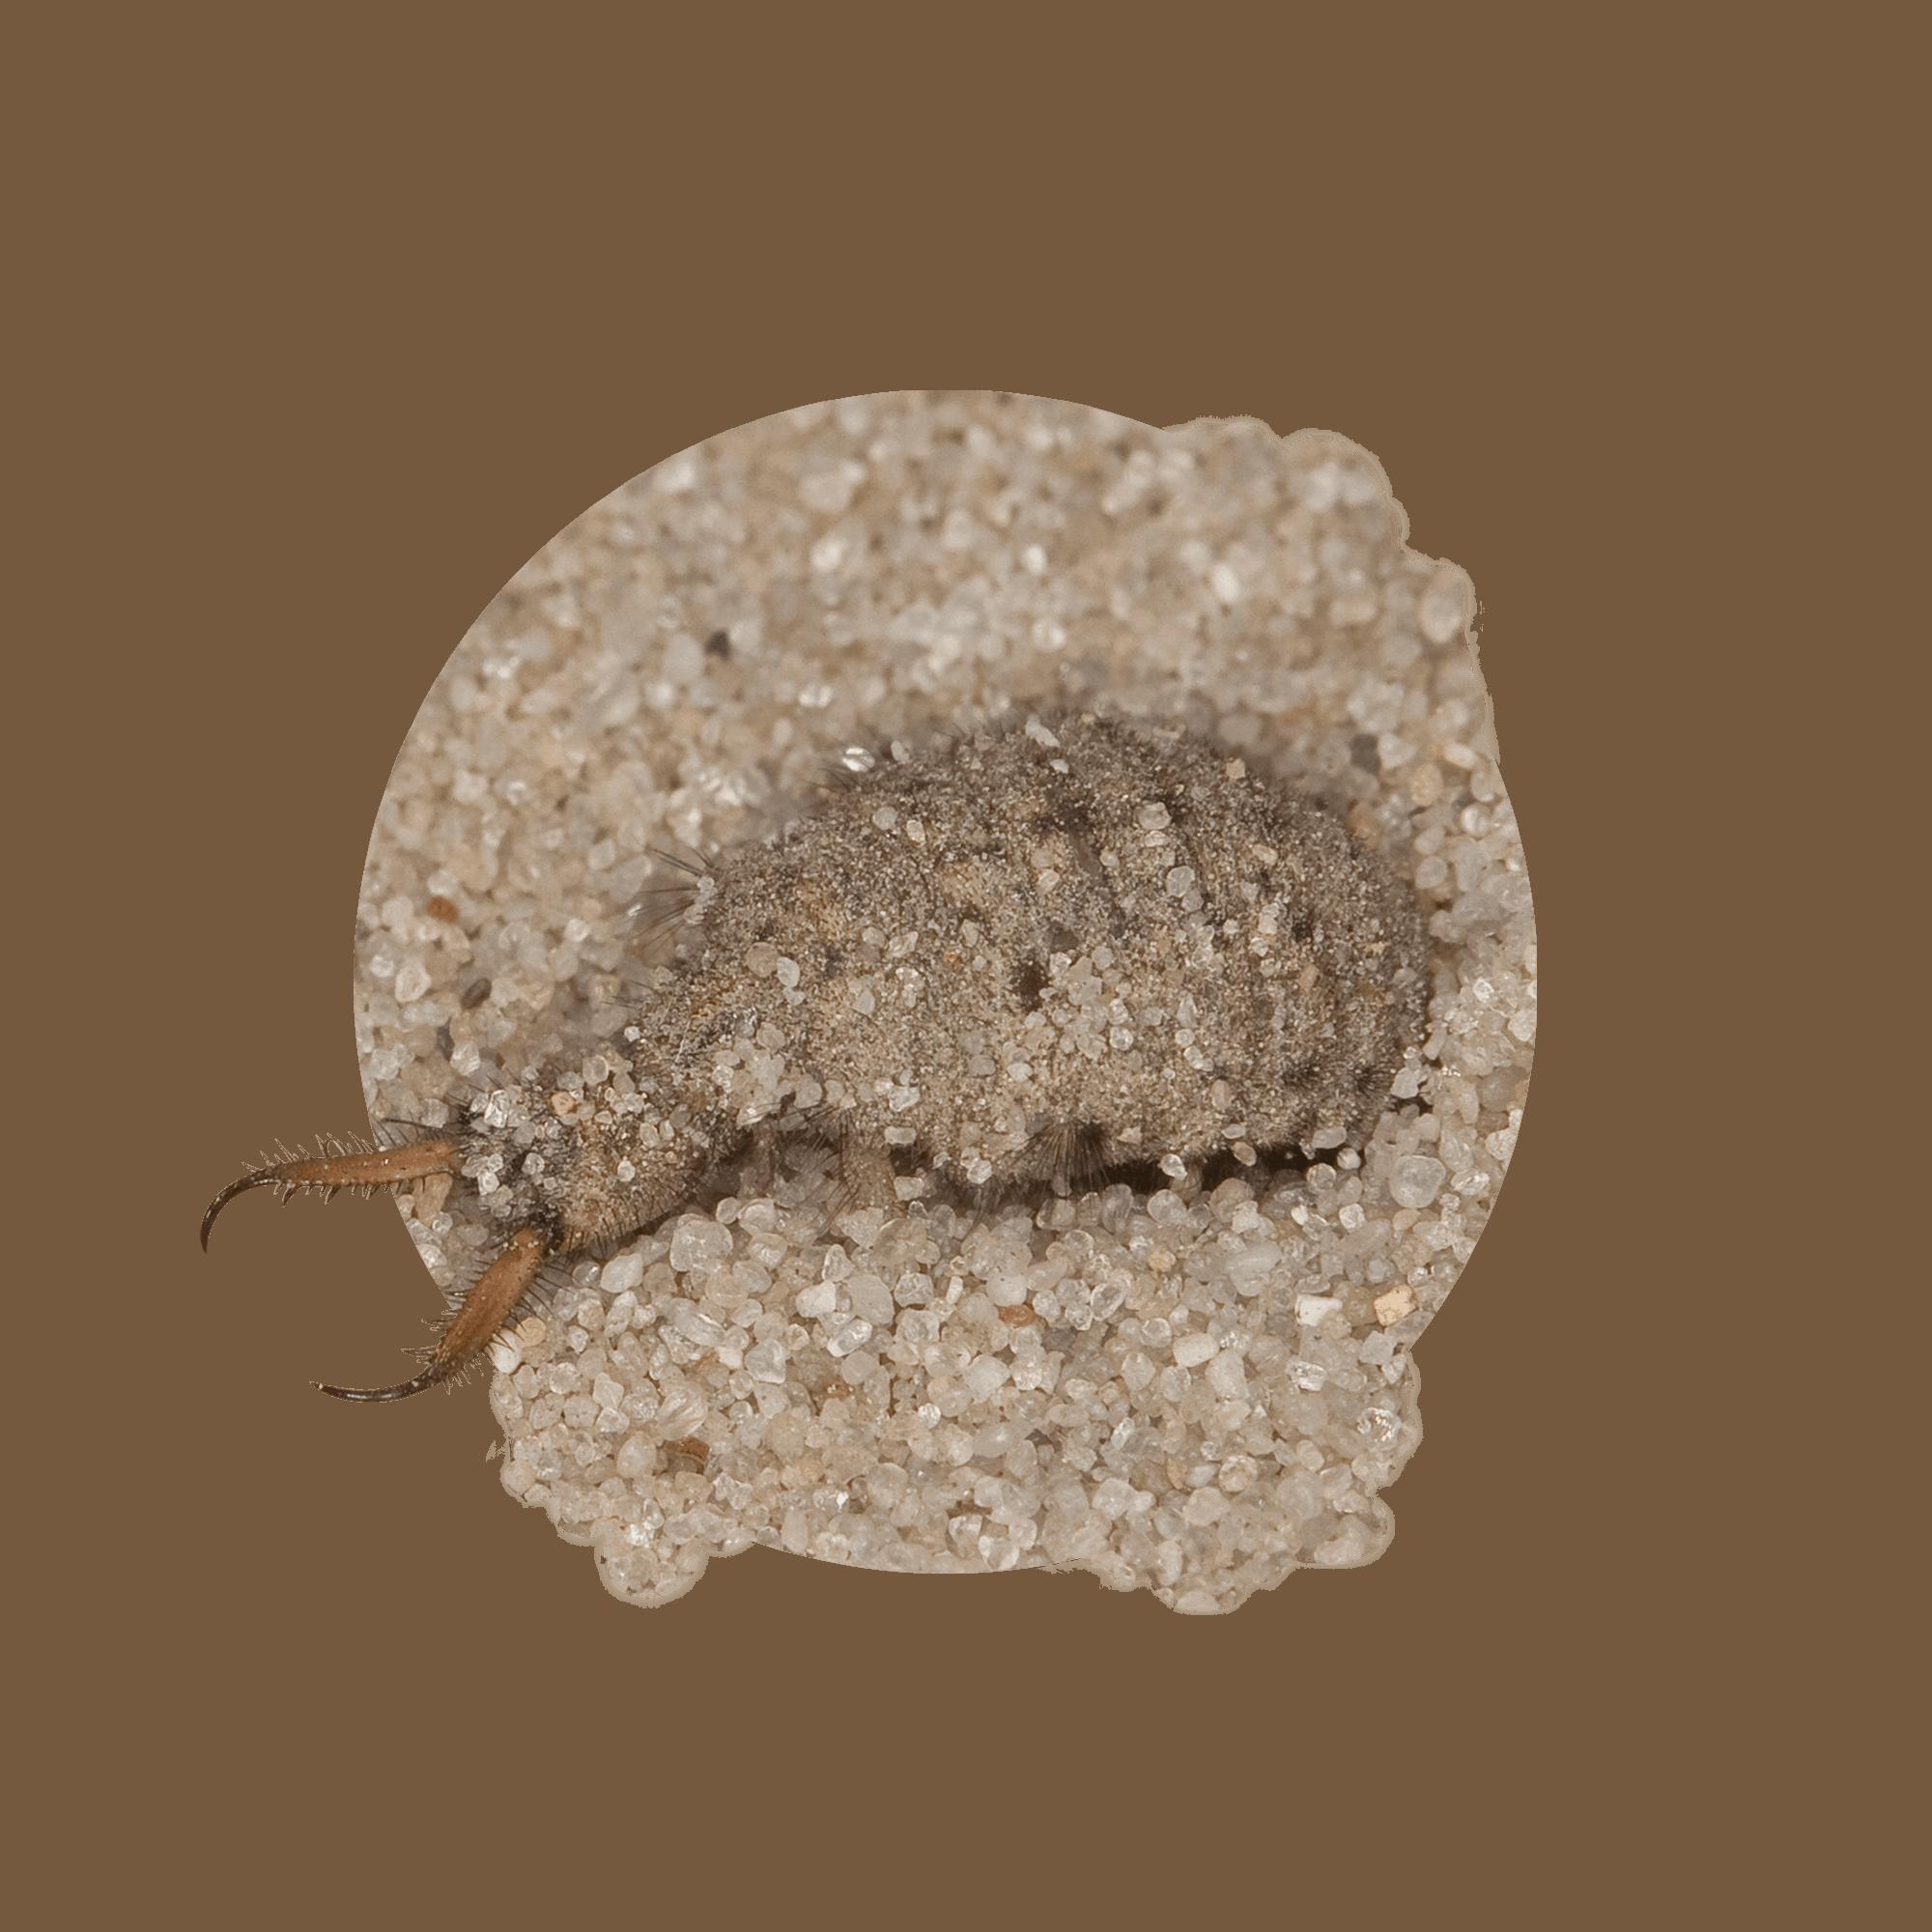 Ameisenjungfer 12